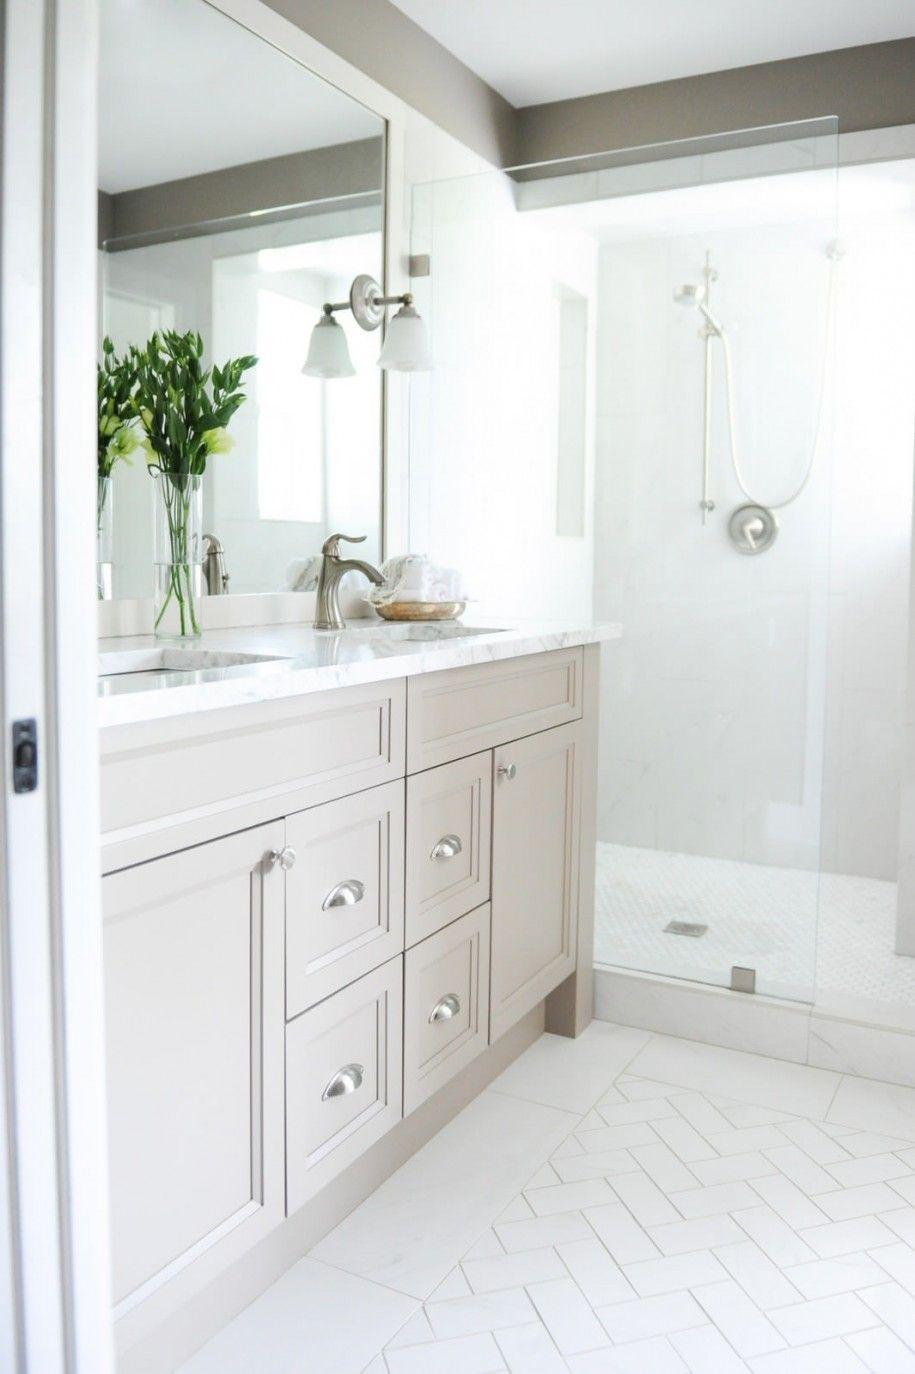 Inspiring Remodel Bathroom plus Bathroom Floor Tile Ideas ...